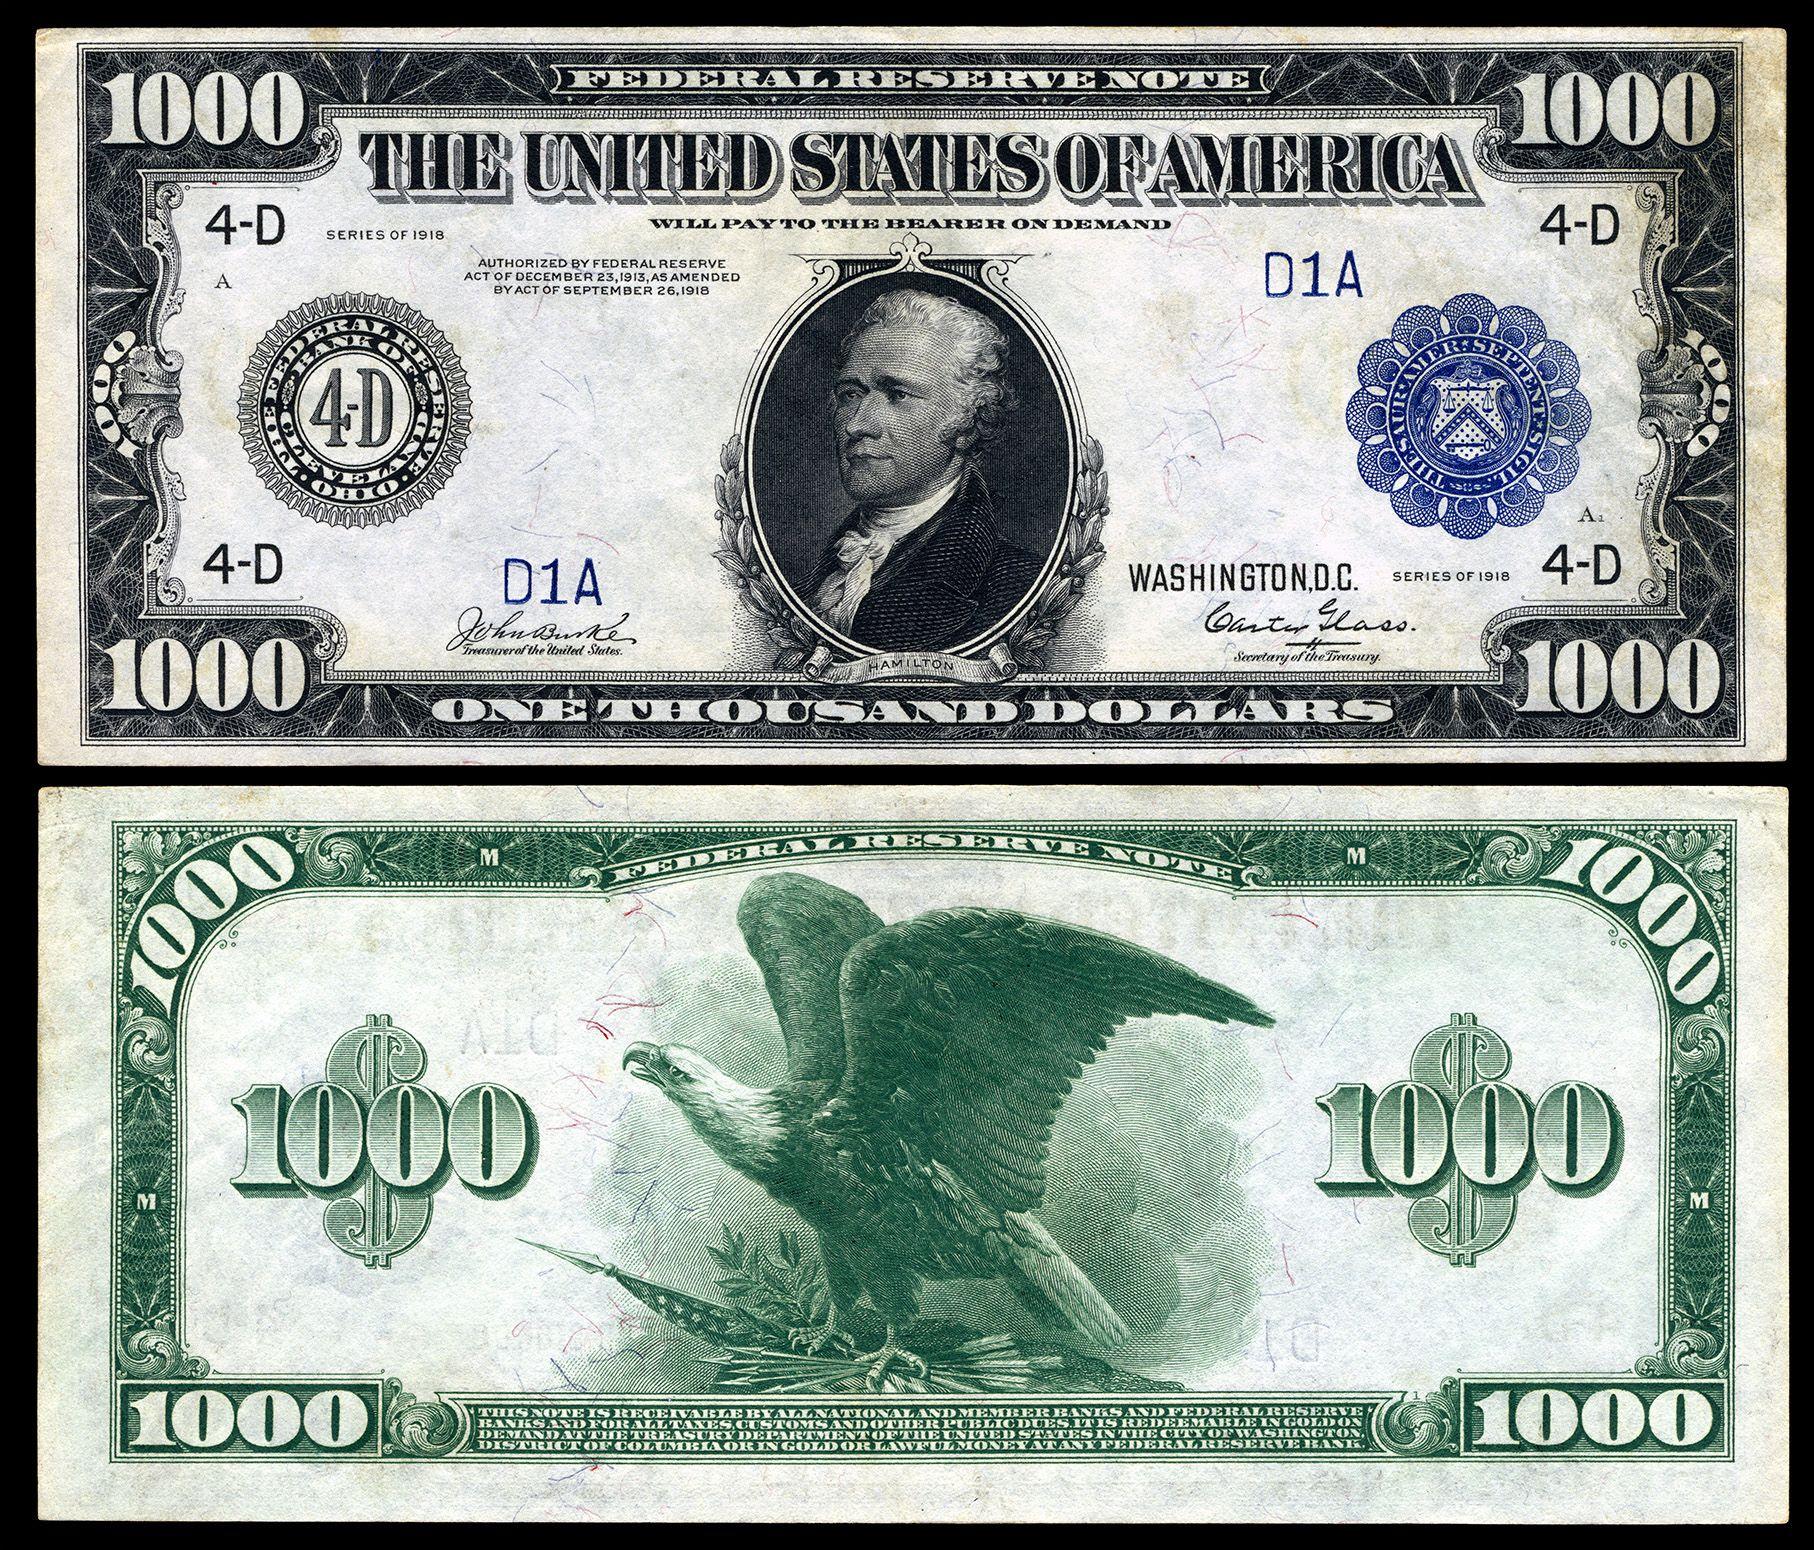 1 000 Dollar Bill Banknotes Money Paper Currency Dollar Bill